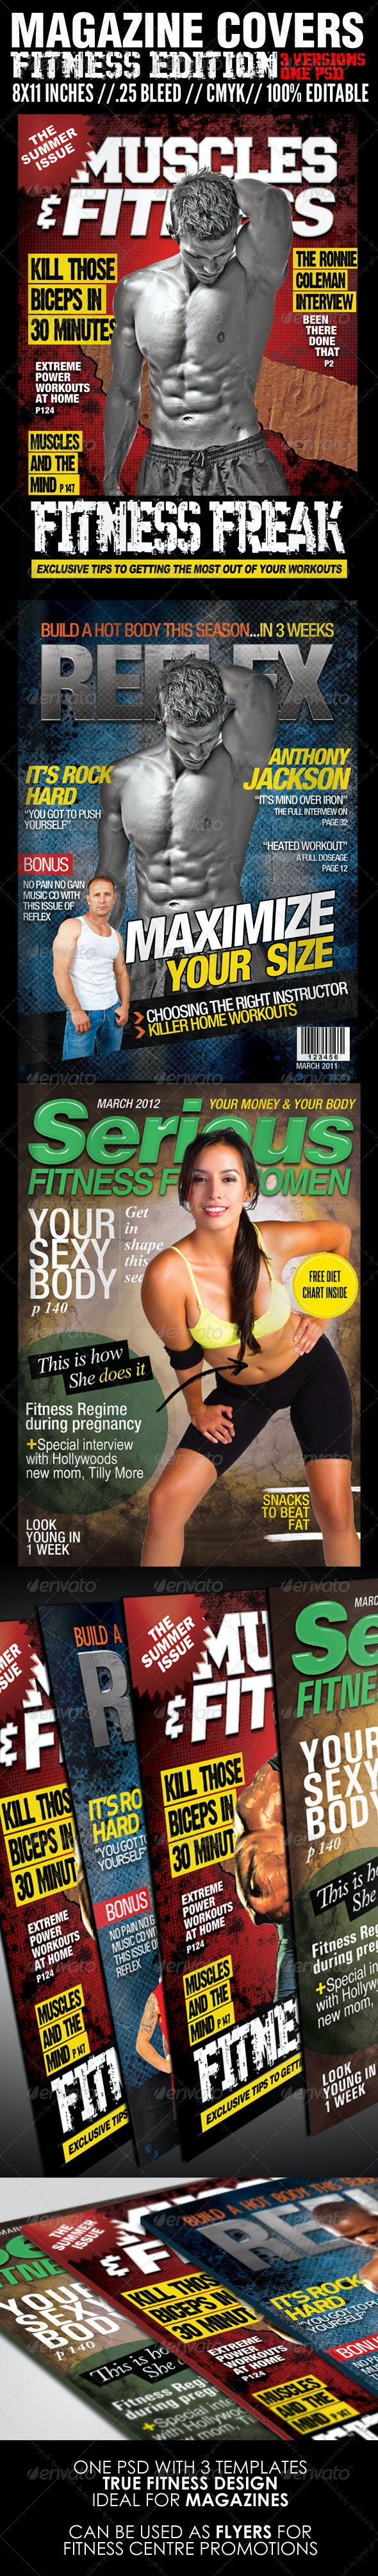 Magazine Cover Templates - Fitness Edition - Magazines Print Templates